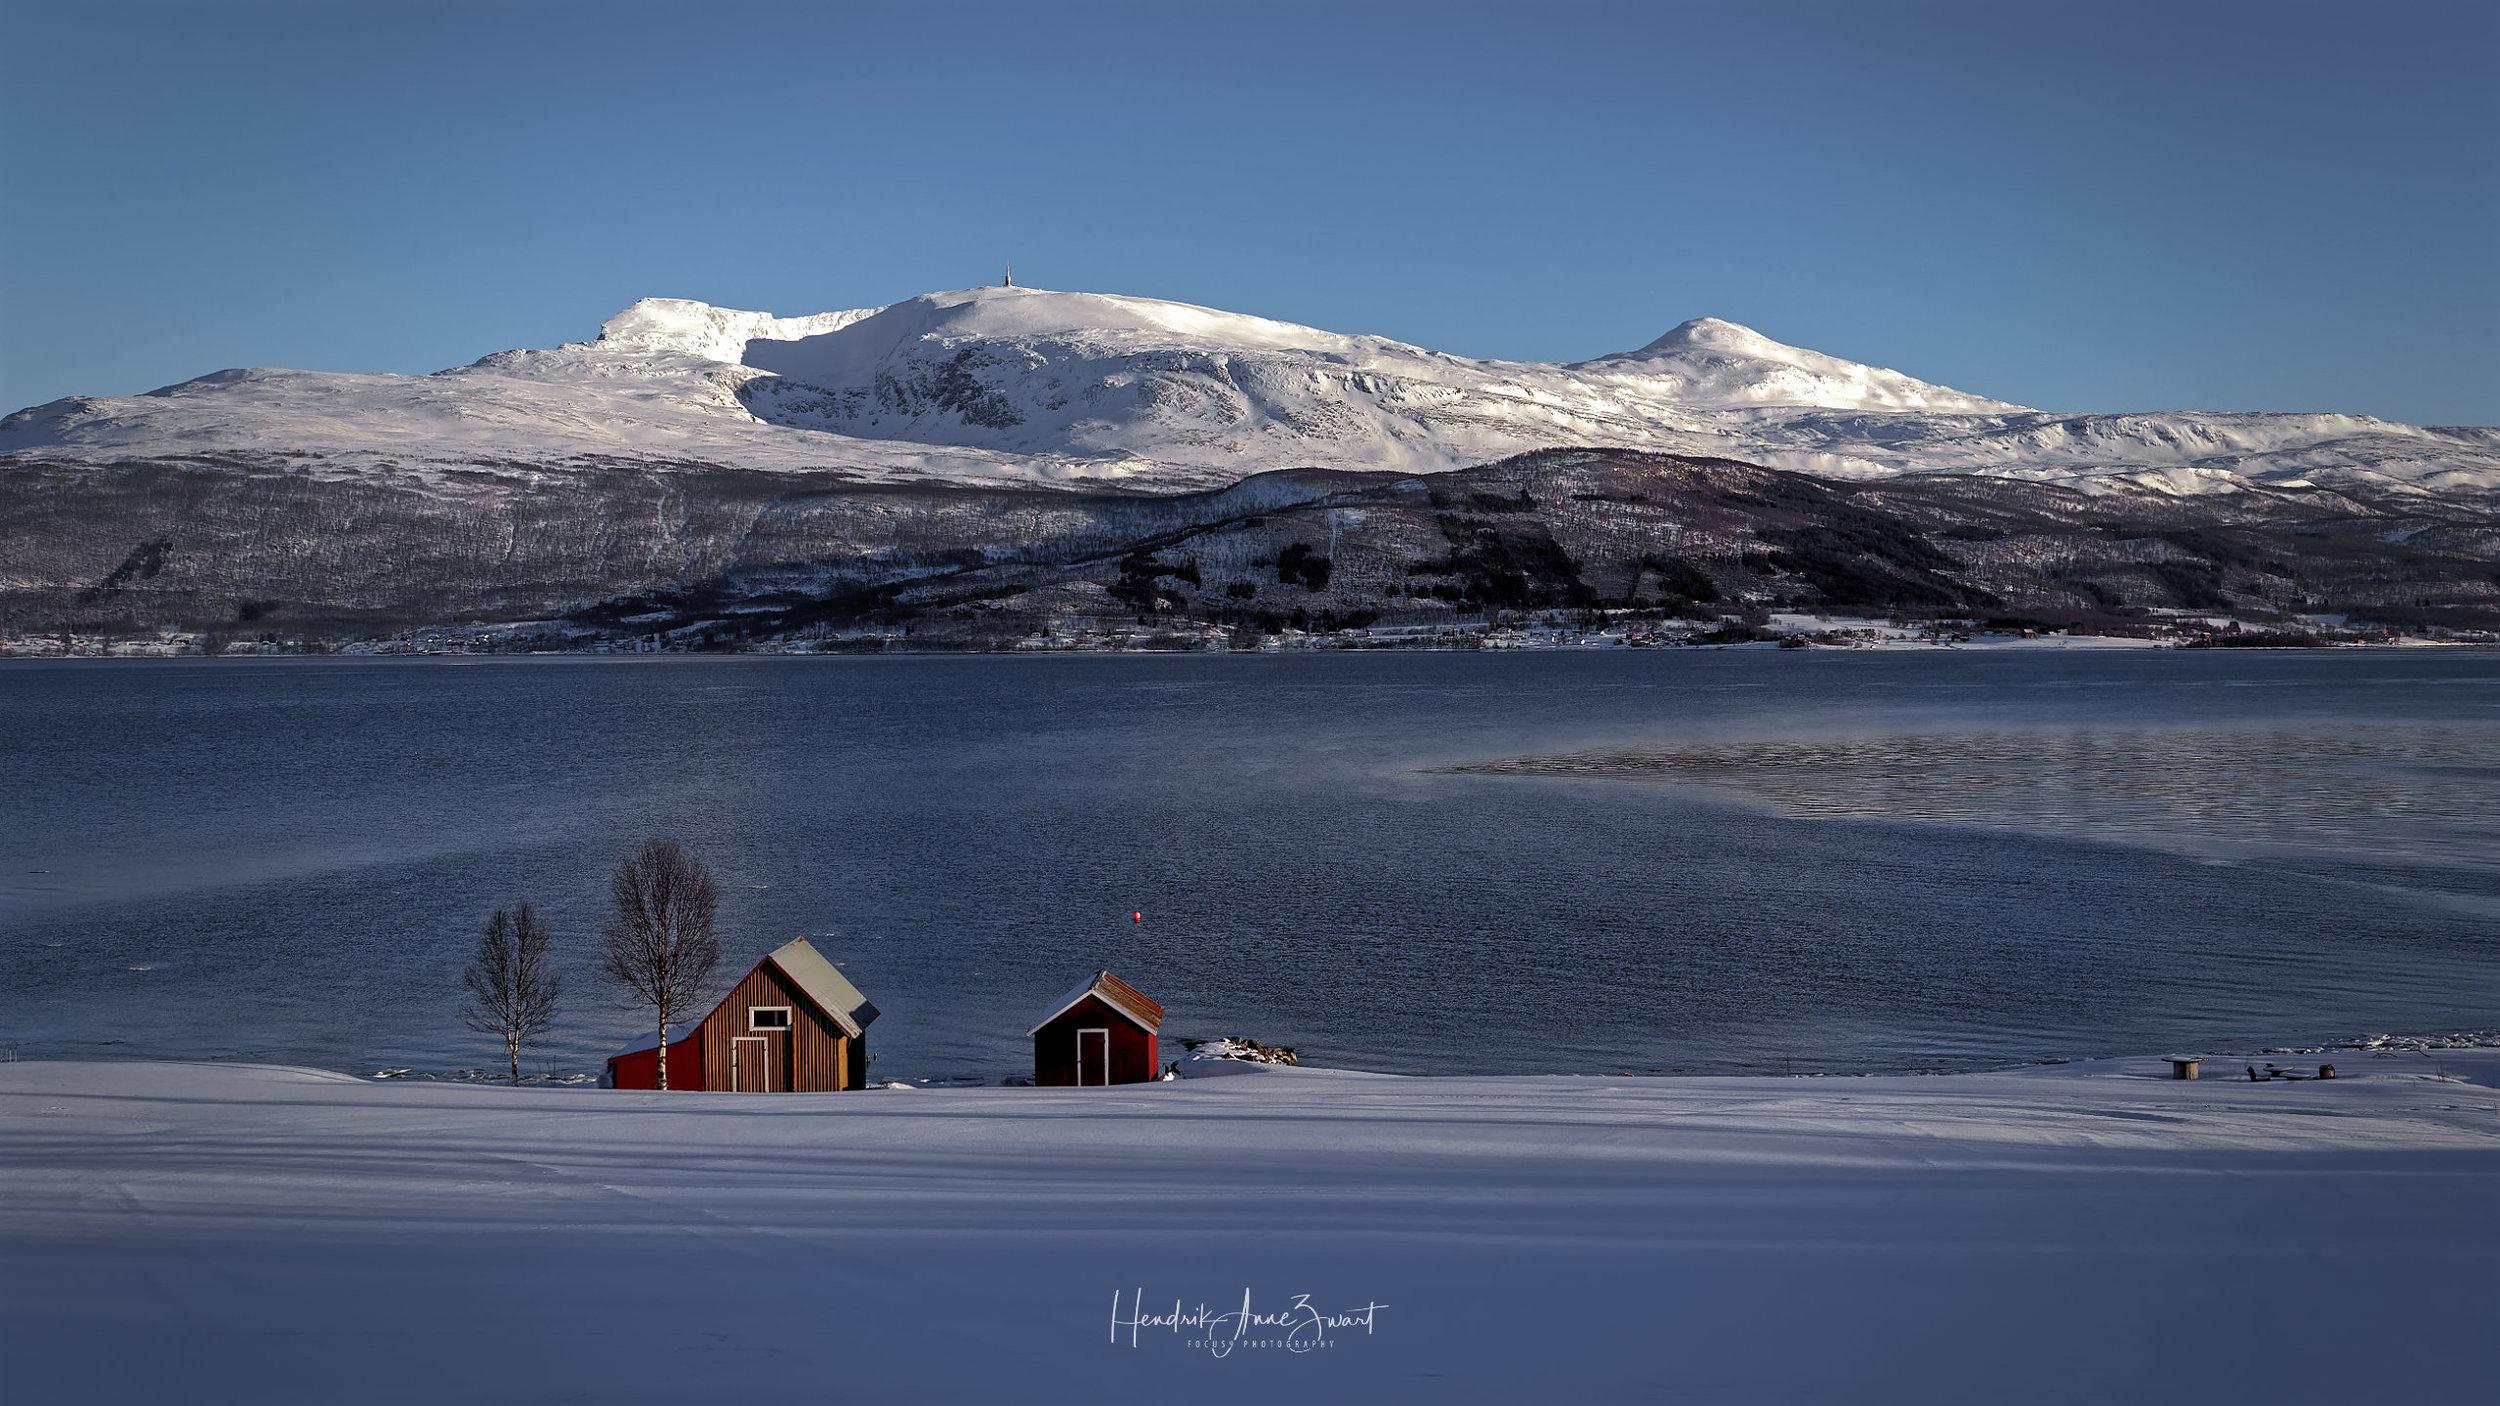 Gibo_Two_Housee_Norway_3.jpg